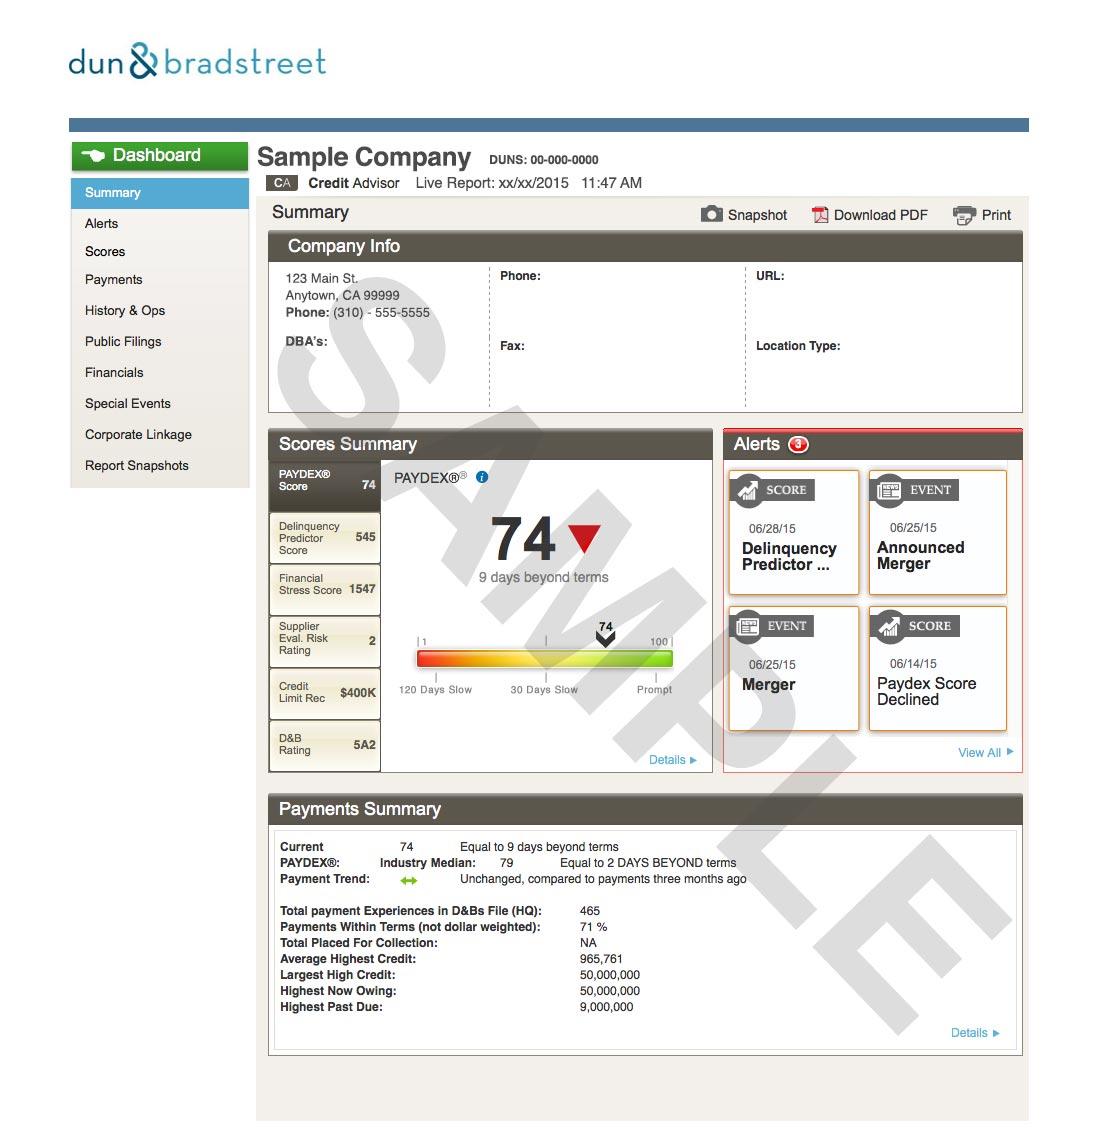 creditadvisor-sample-reportAr2